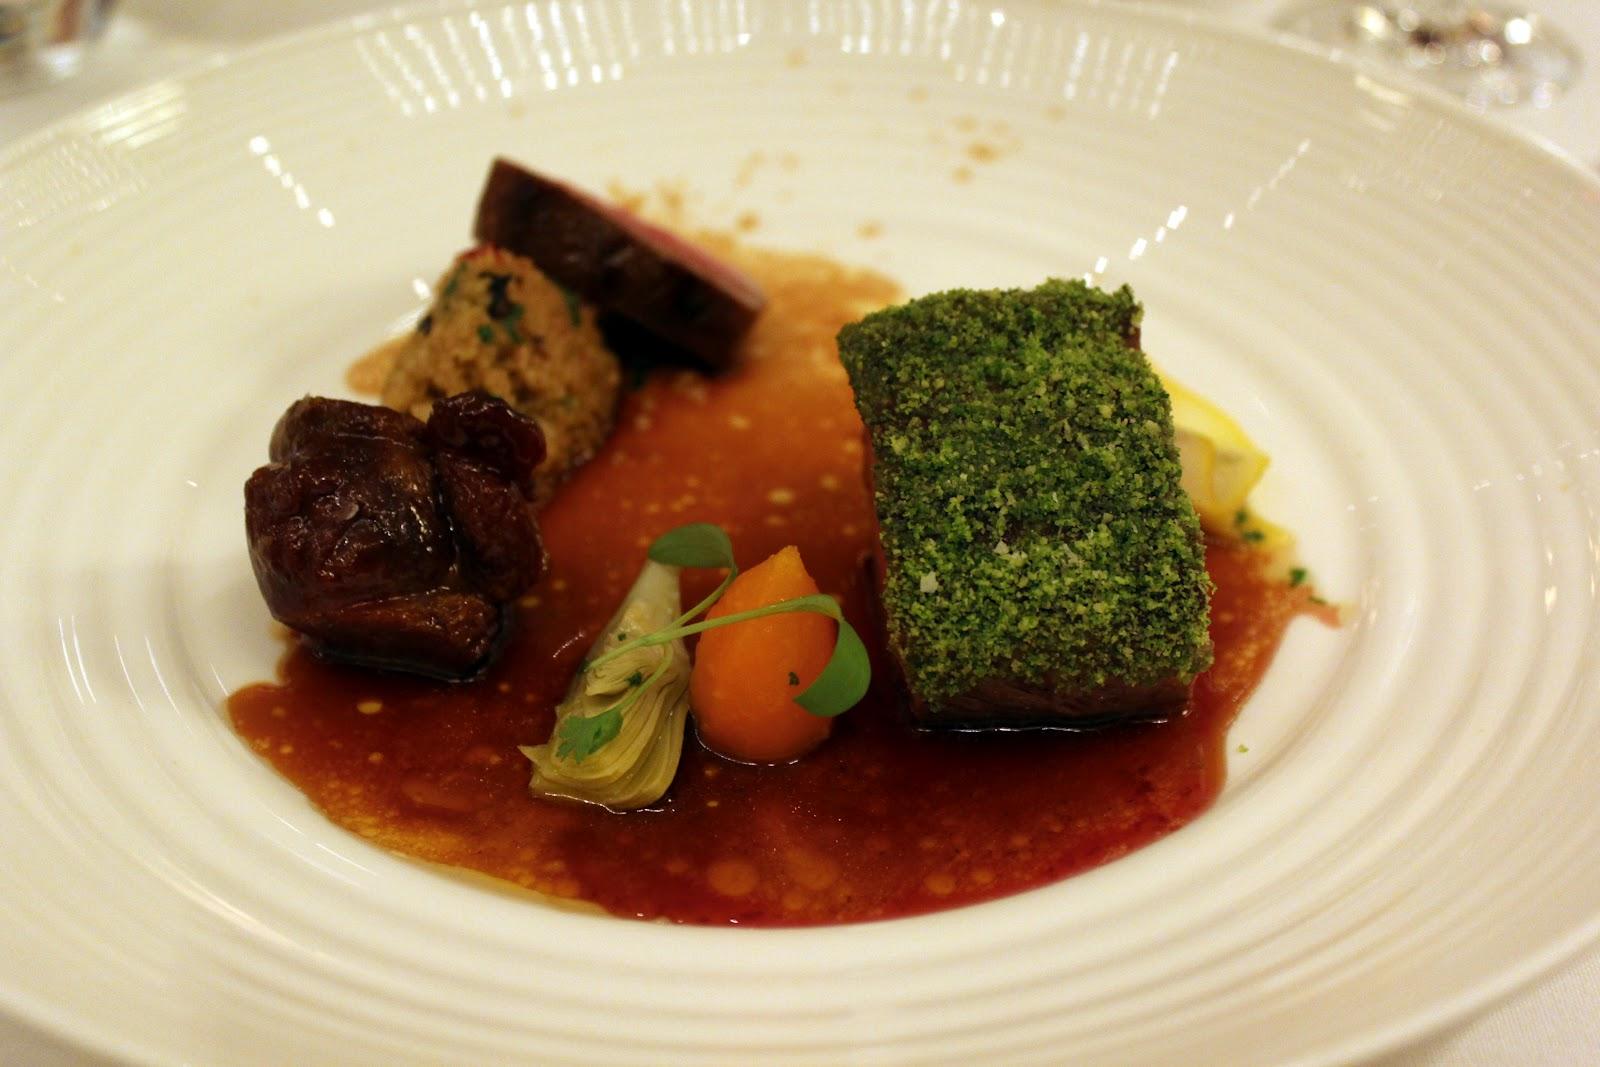 Muffin + Tim Tam's Gastronomic Adventures: Gordon Ramsay at the London ...